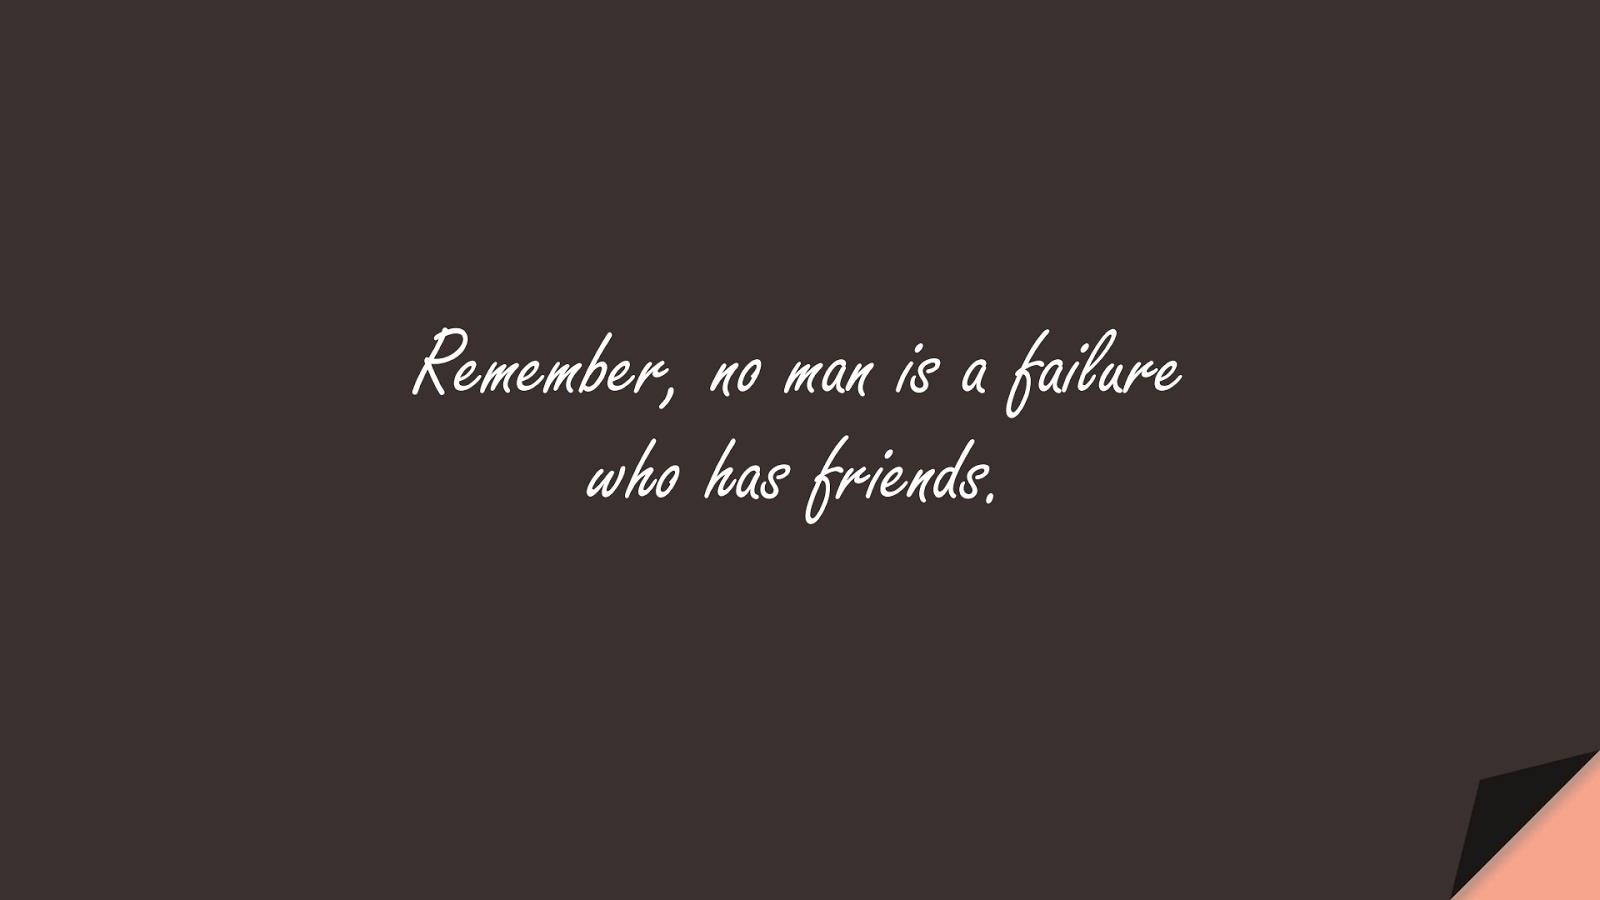 Remember, no man is a failure who has friends.FALSE